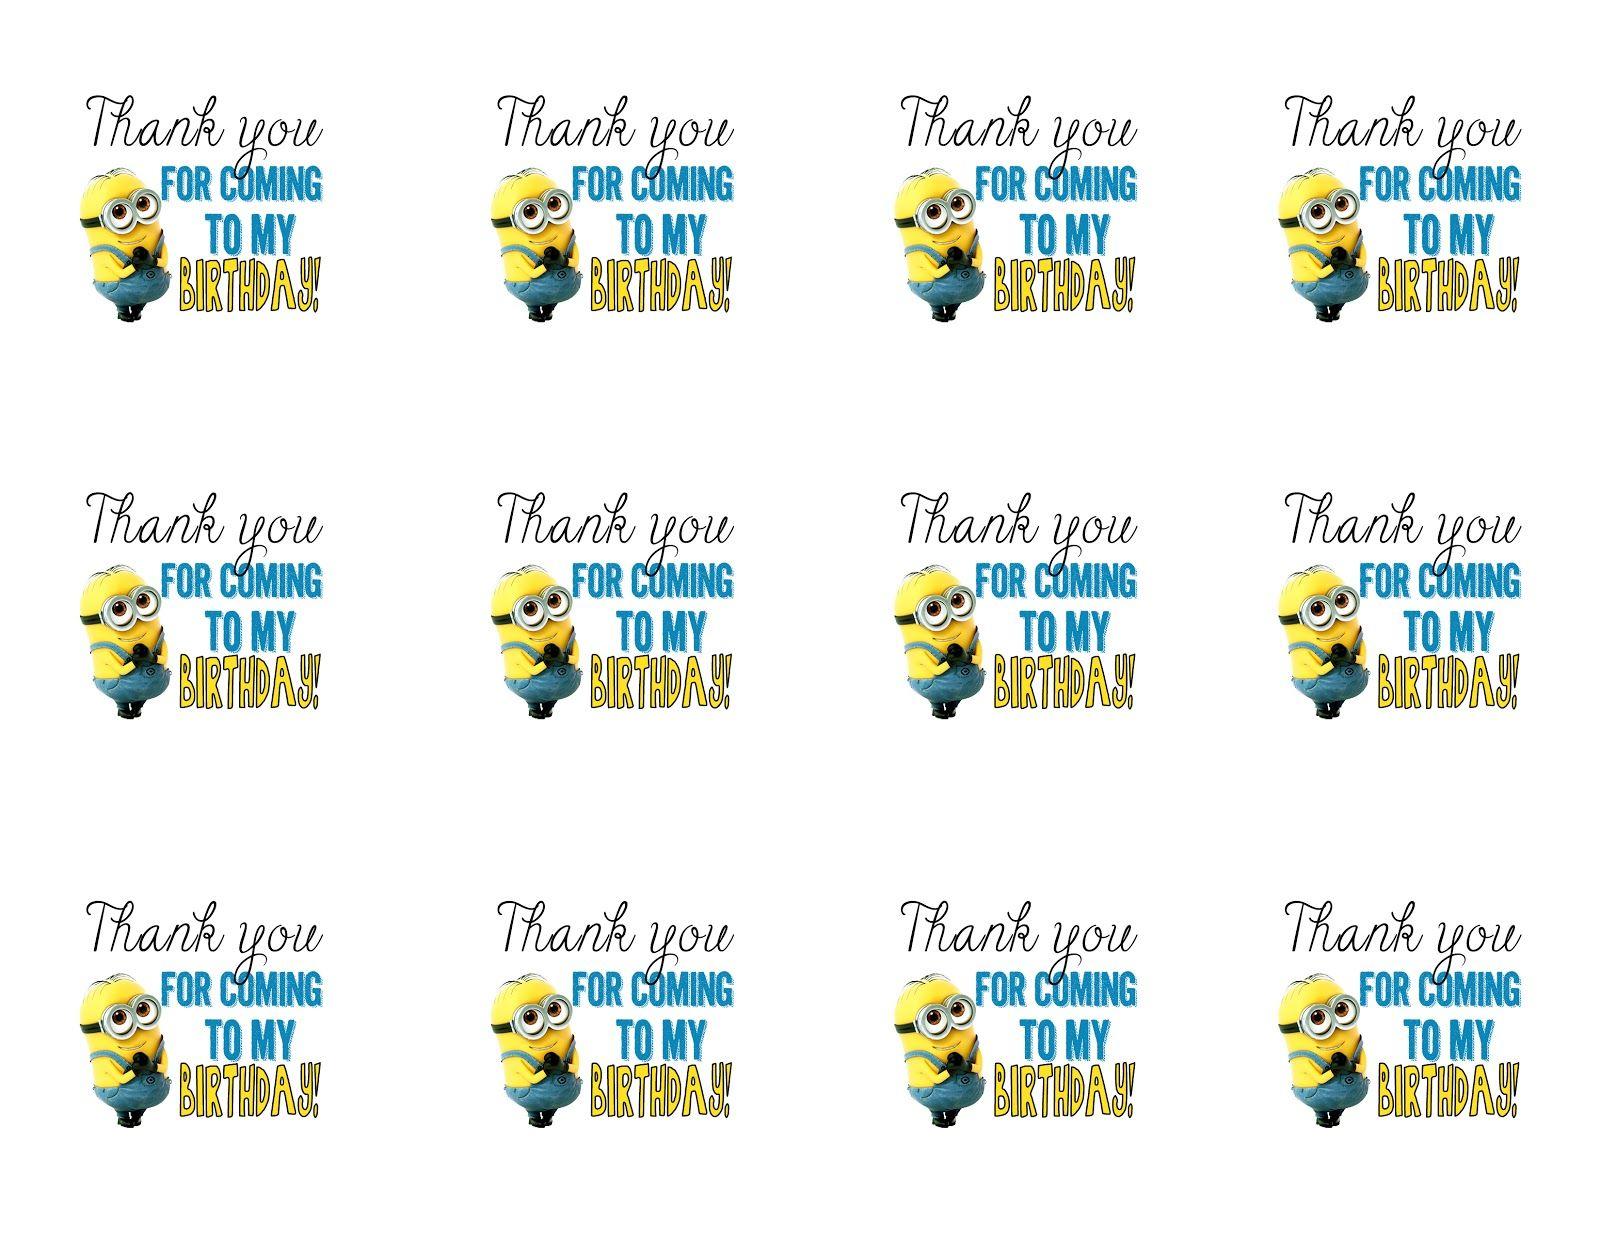 Diy Design Den: Minion Birthday Party With Free Printables. | Minion - Thanks A Minion Free Printable